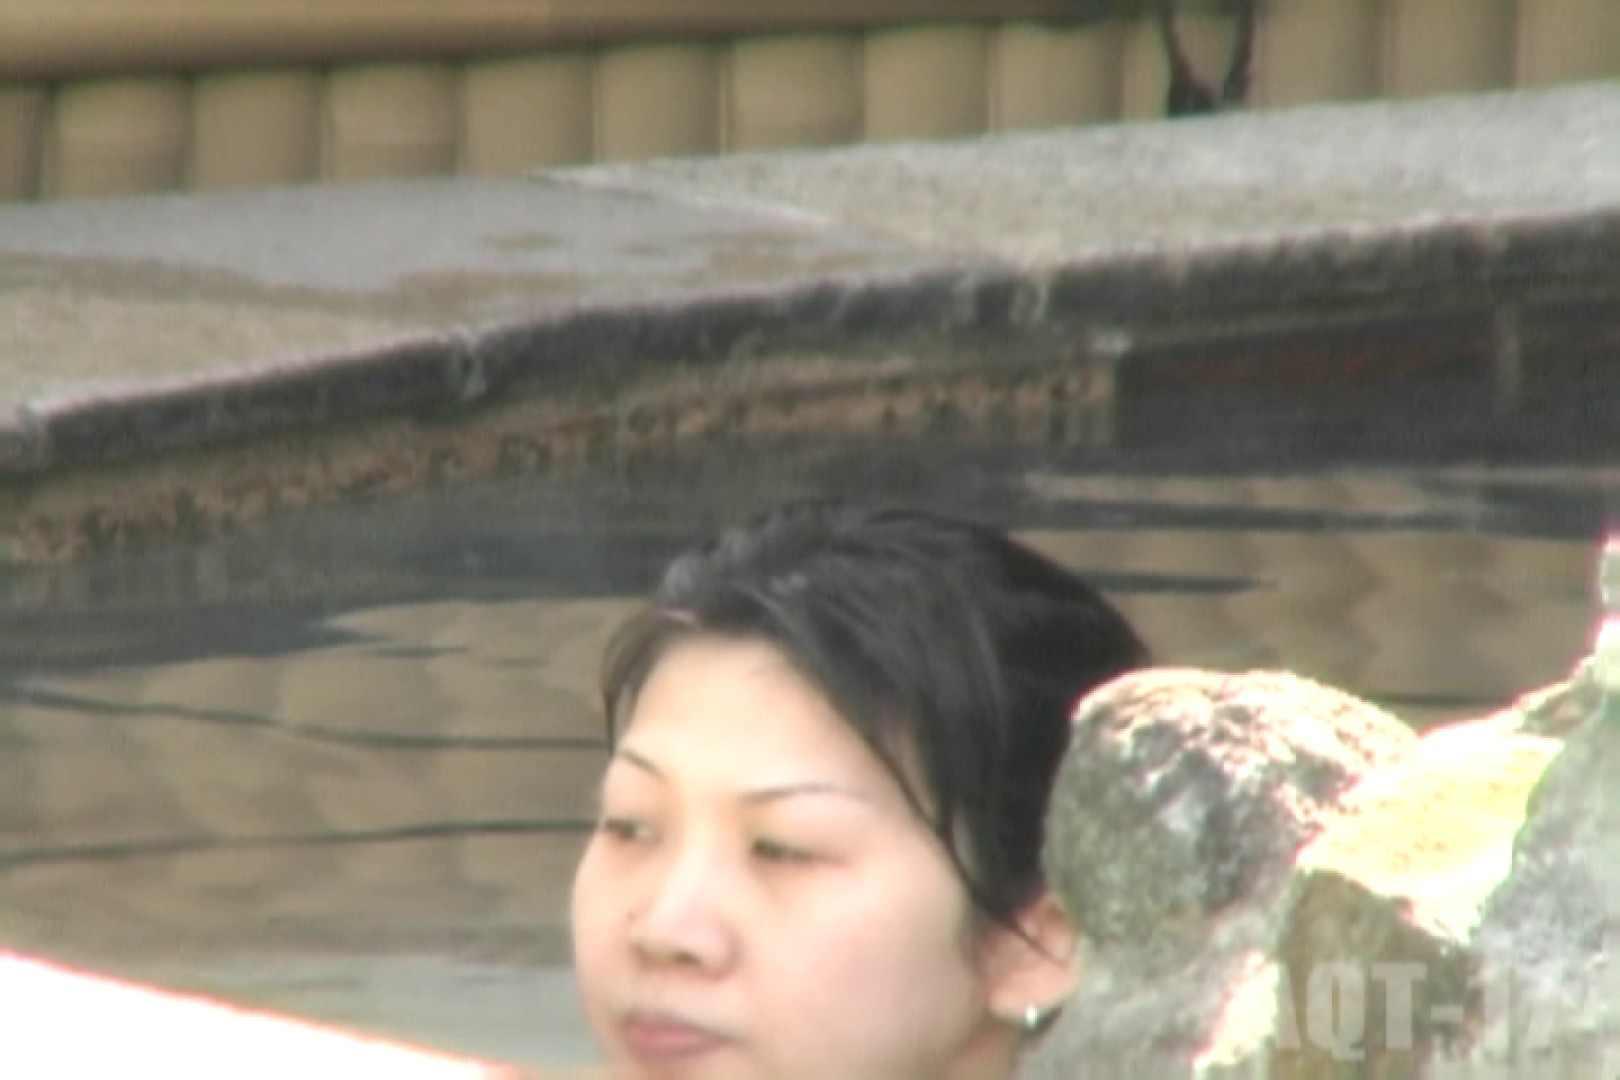 Aquaな露天風呂Vol.850 盗撮 AV無料動画キャプチャ 76連発 20